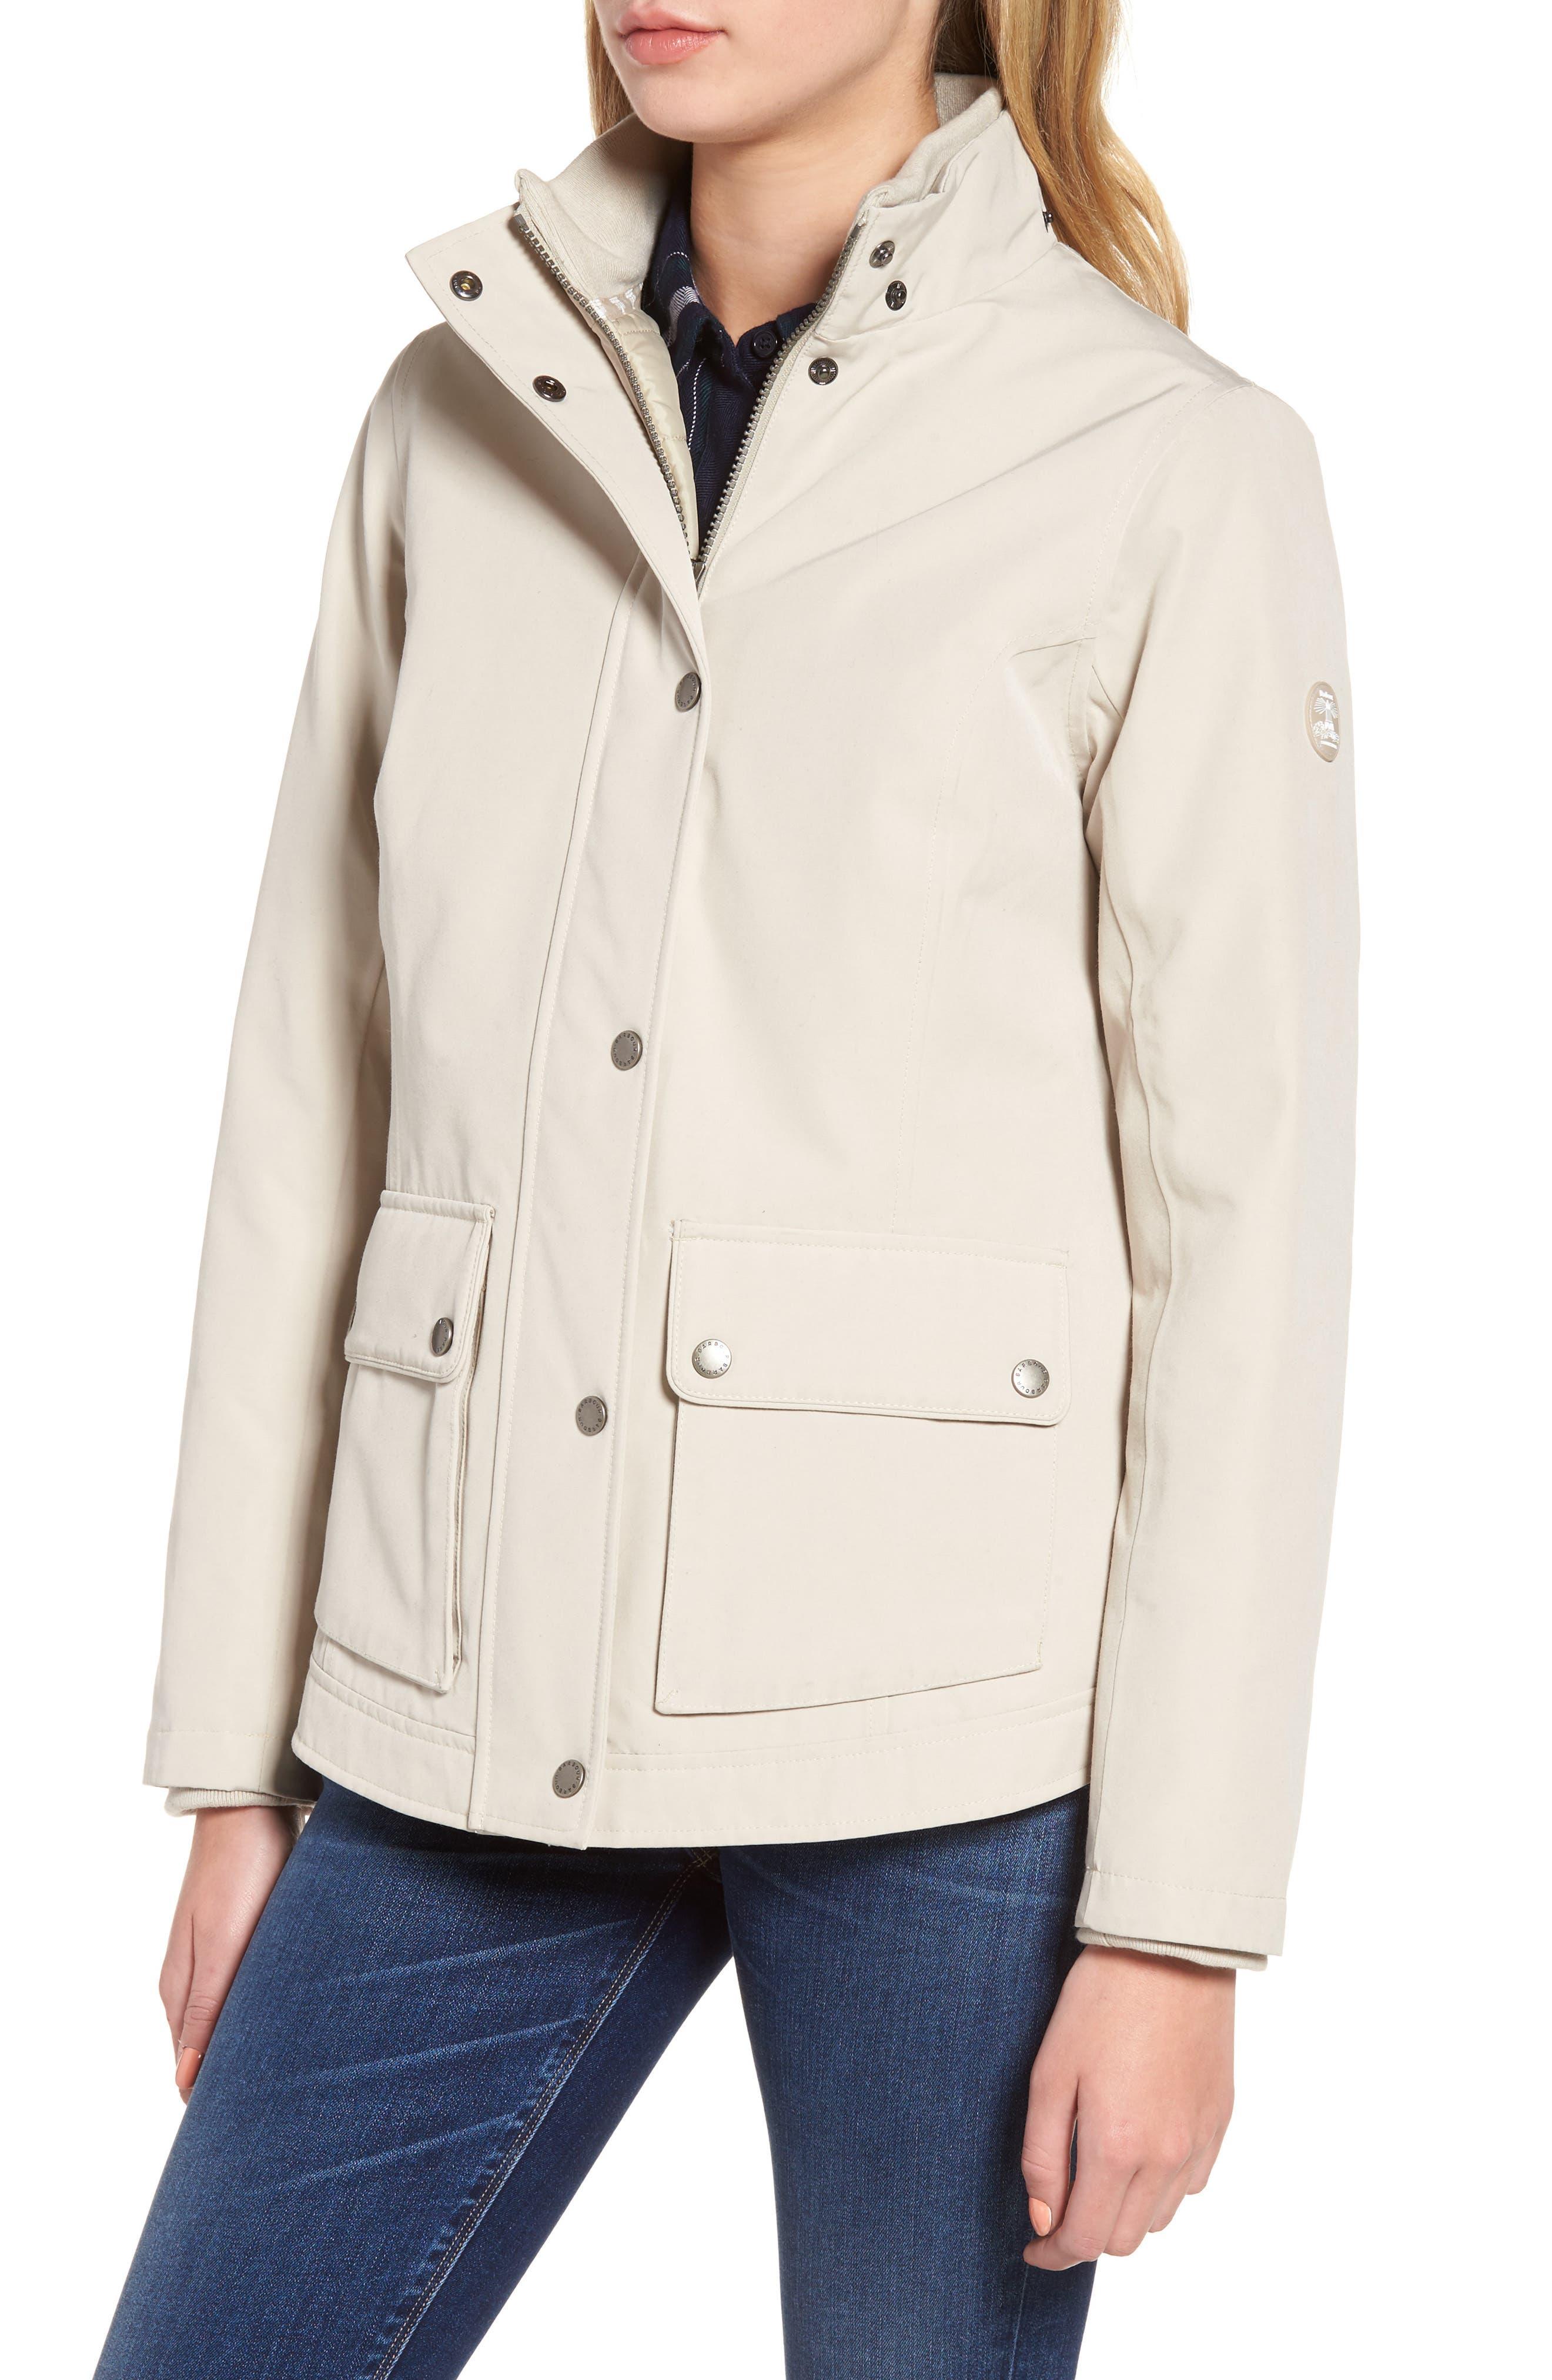 Seaton Hooded Waterproof Jacket,                             Alternate thumbnail 3, color,                             Mist